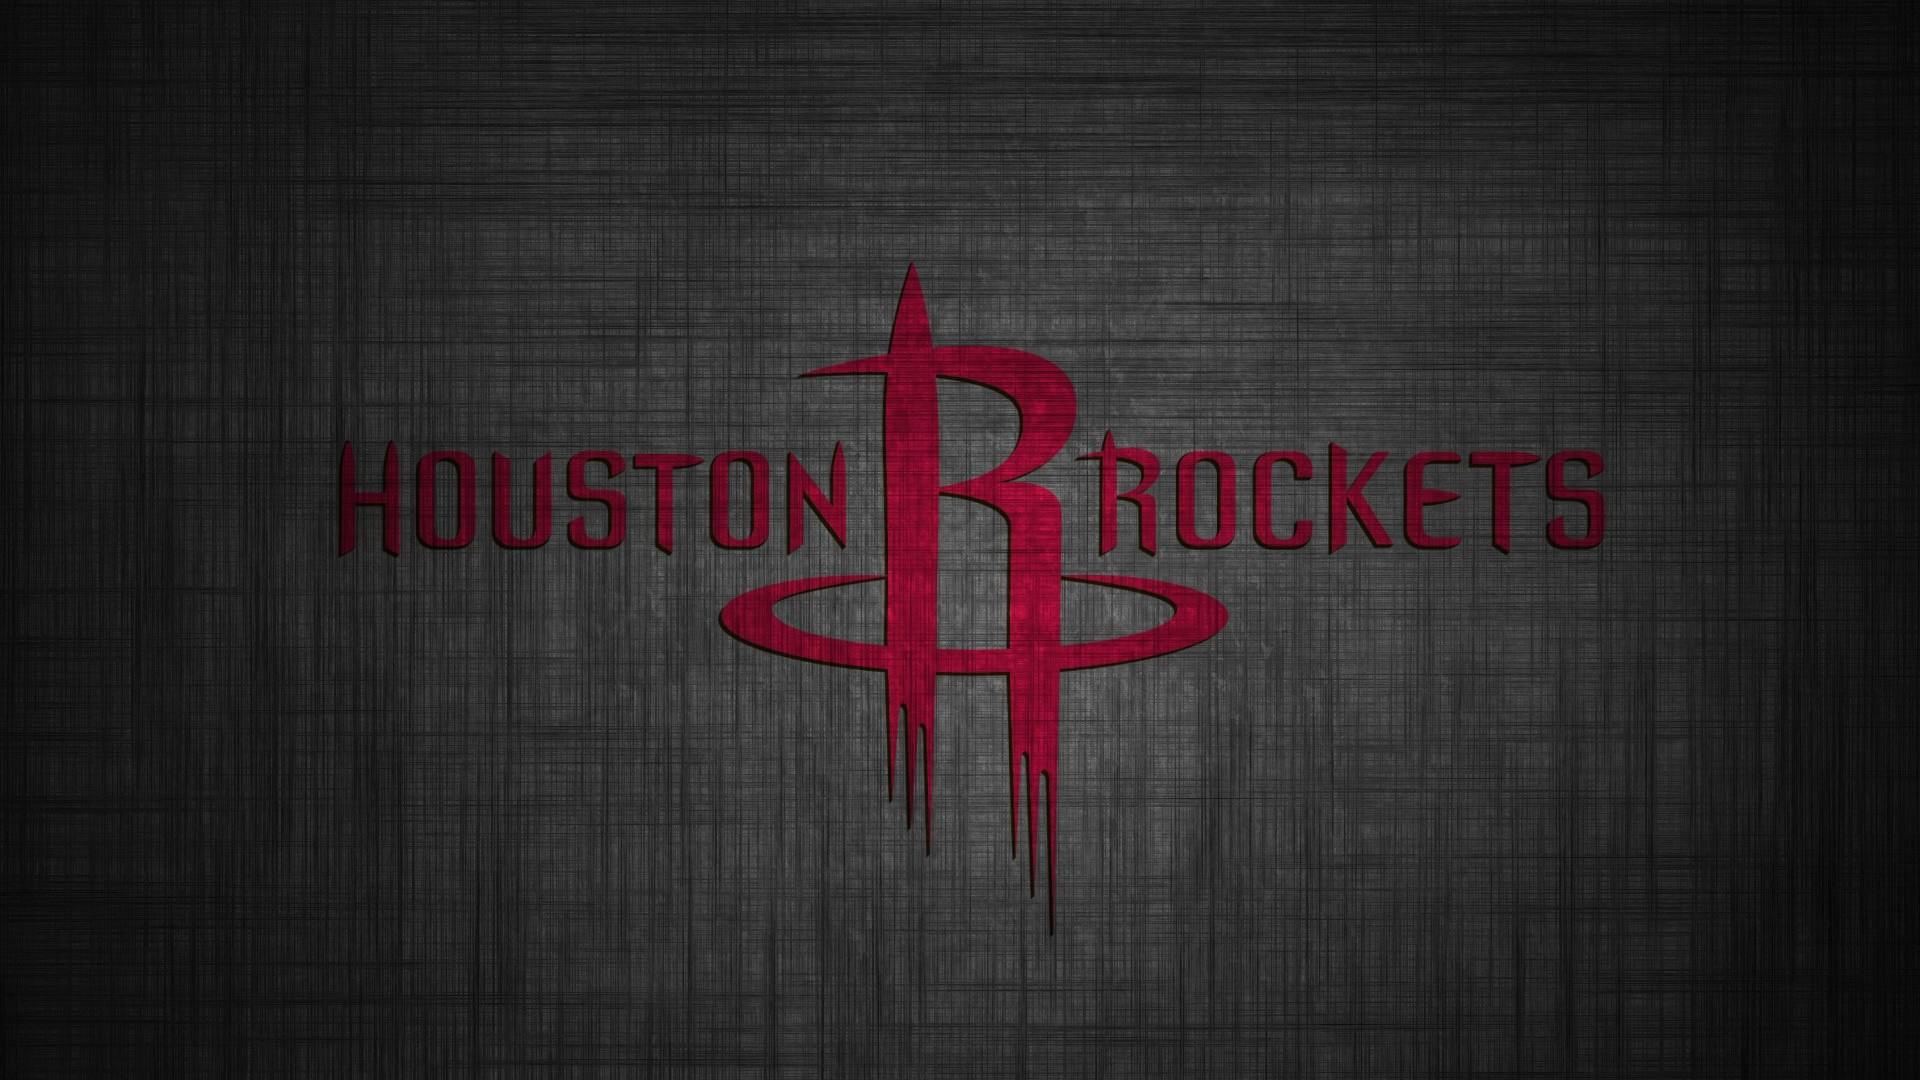 Houston Rockets Wallpapers – Wallpaper Cave | Free Wallpapers | Pinterest |  Wallpaper